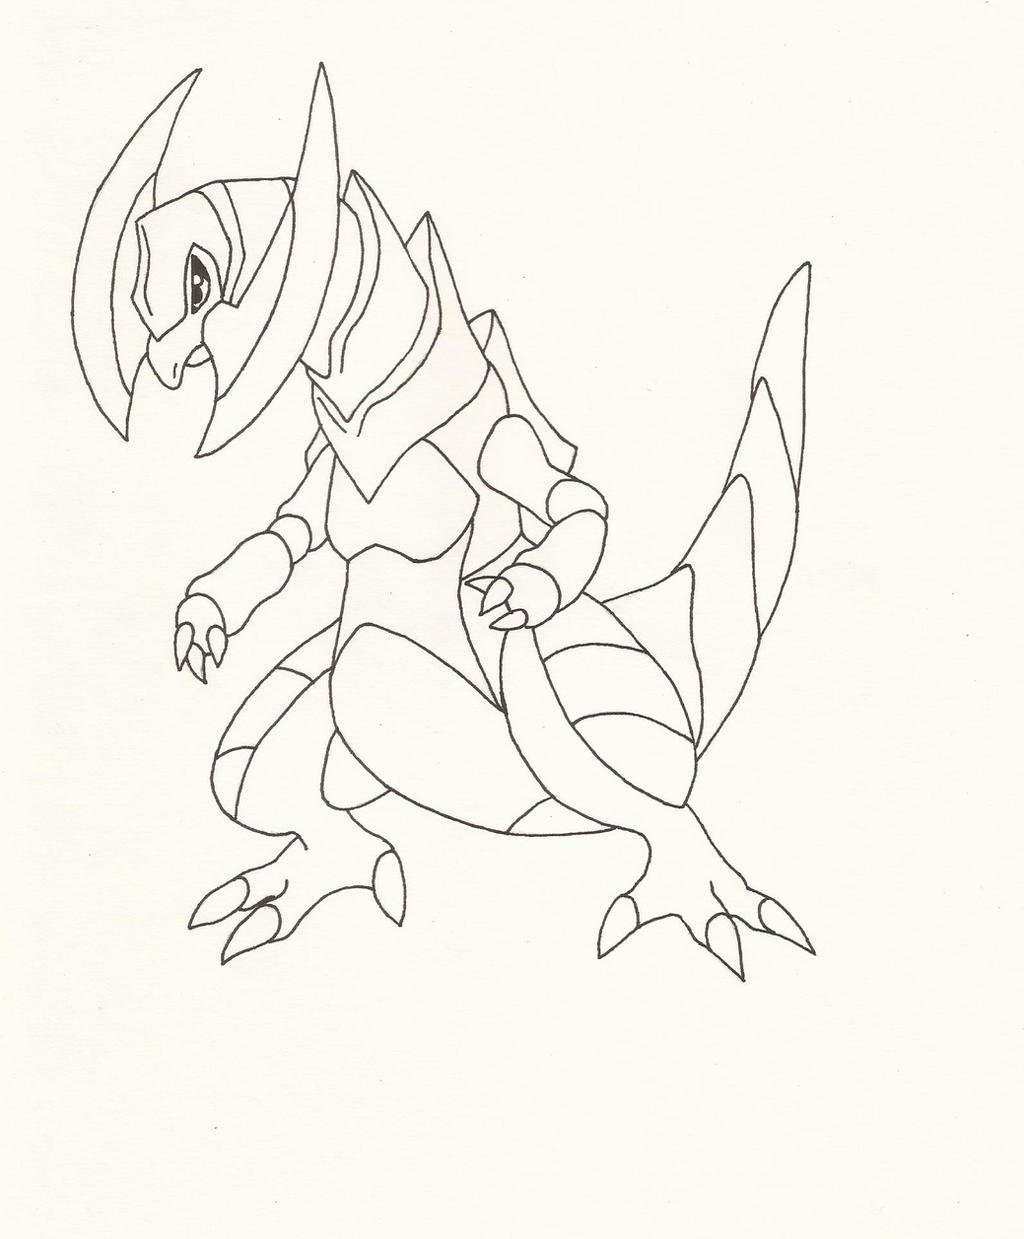 Haxorus coloring pages - Pokemon Haxorus By Superheroarts Manga Anime Digital Media Drawings